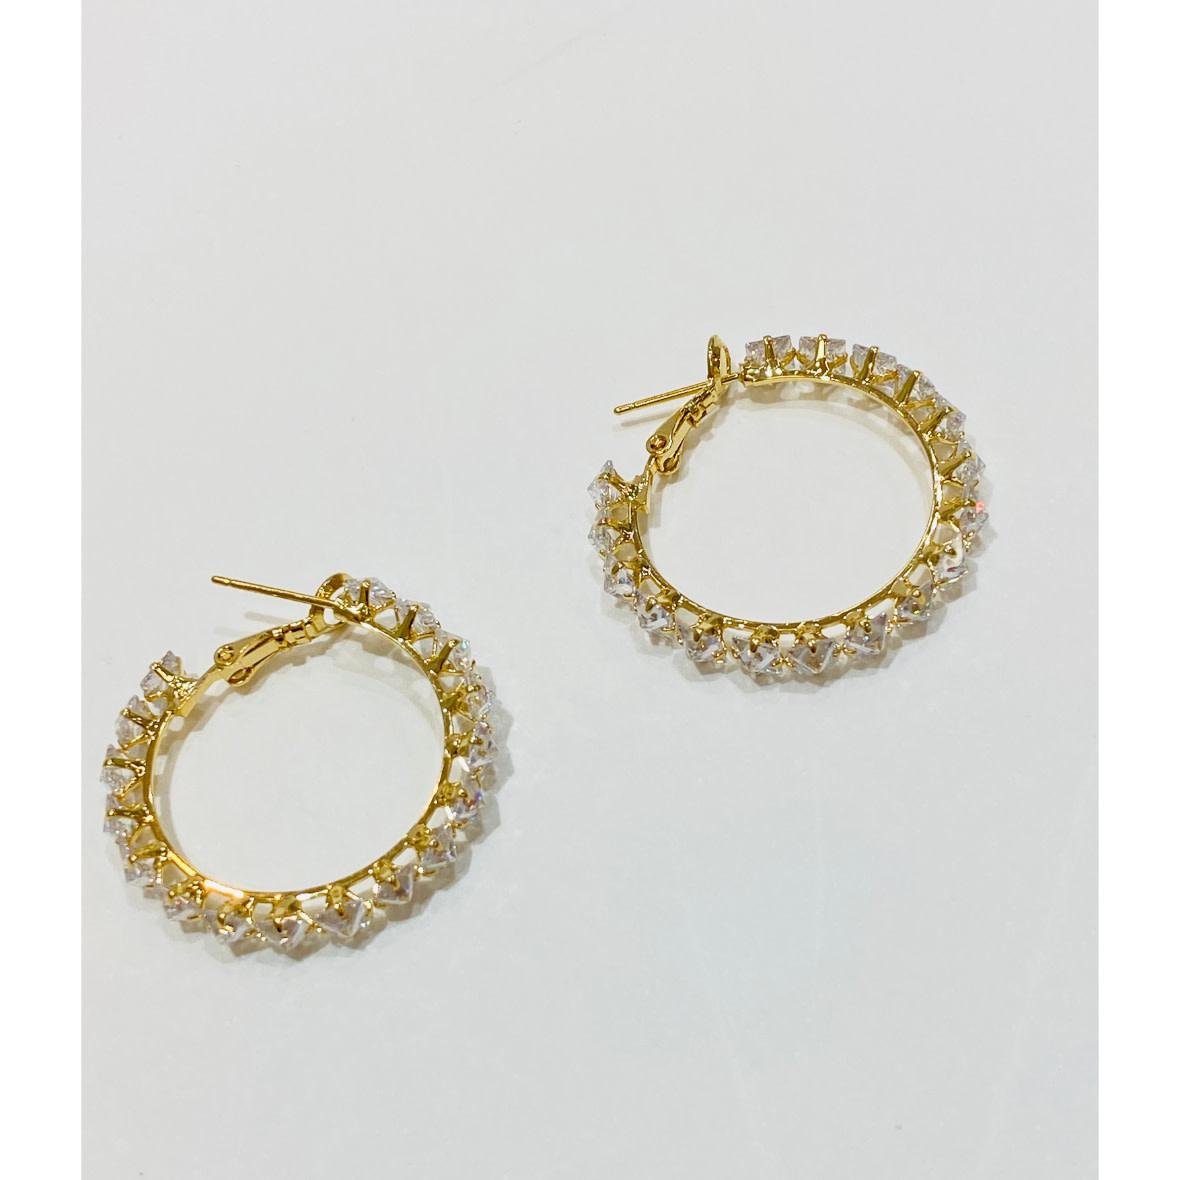 Theia Jewelry Theia Jewelry Priscila Hoop Earring